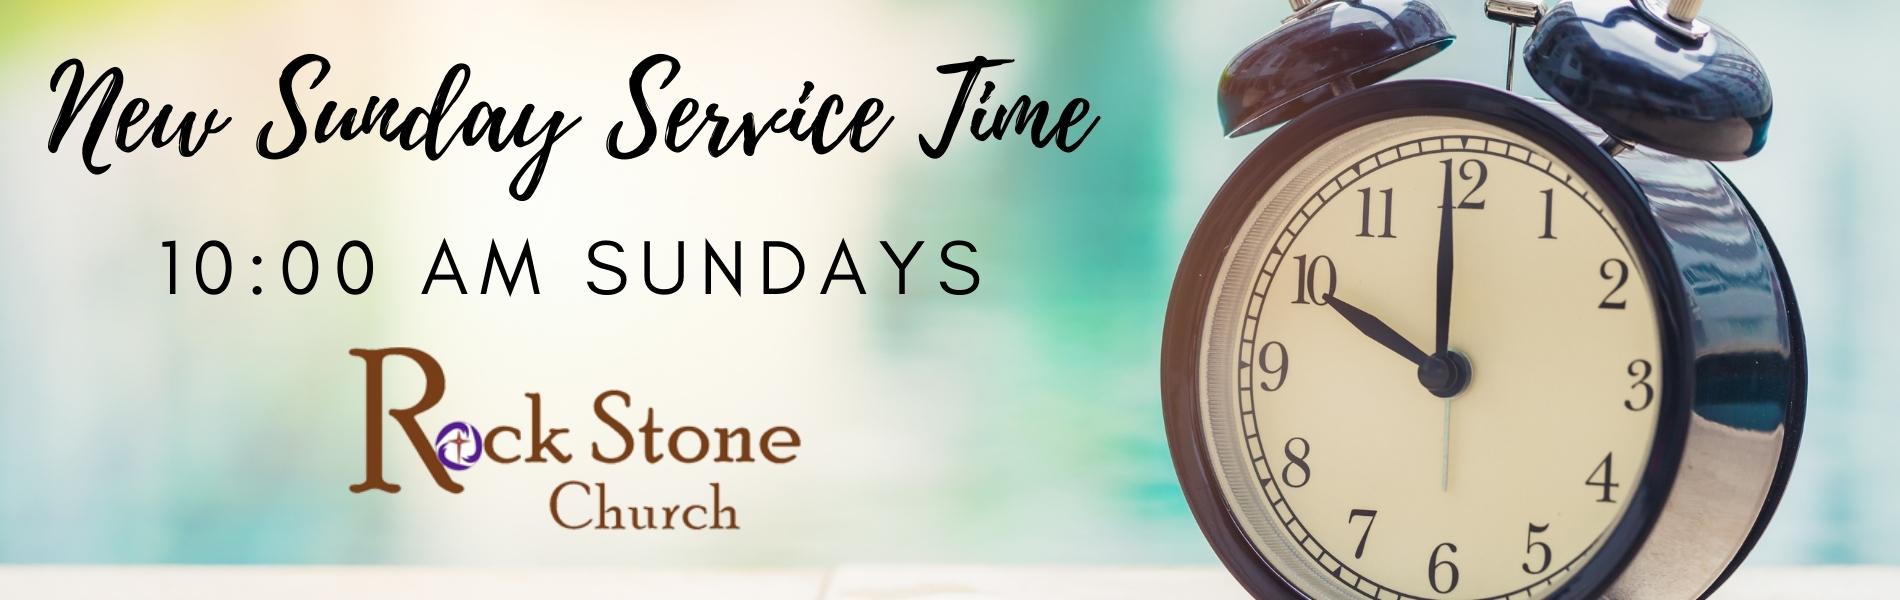 service-times